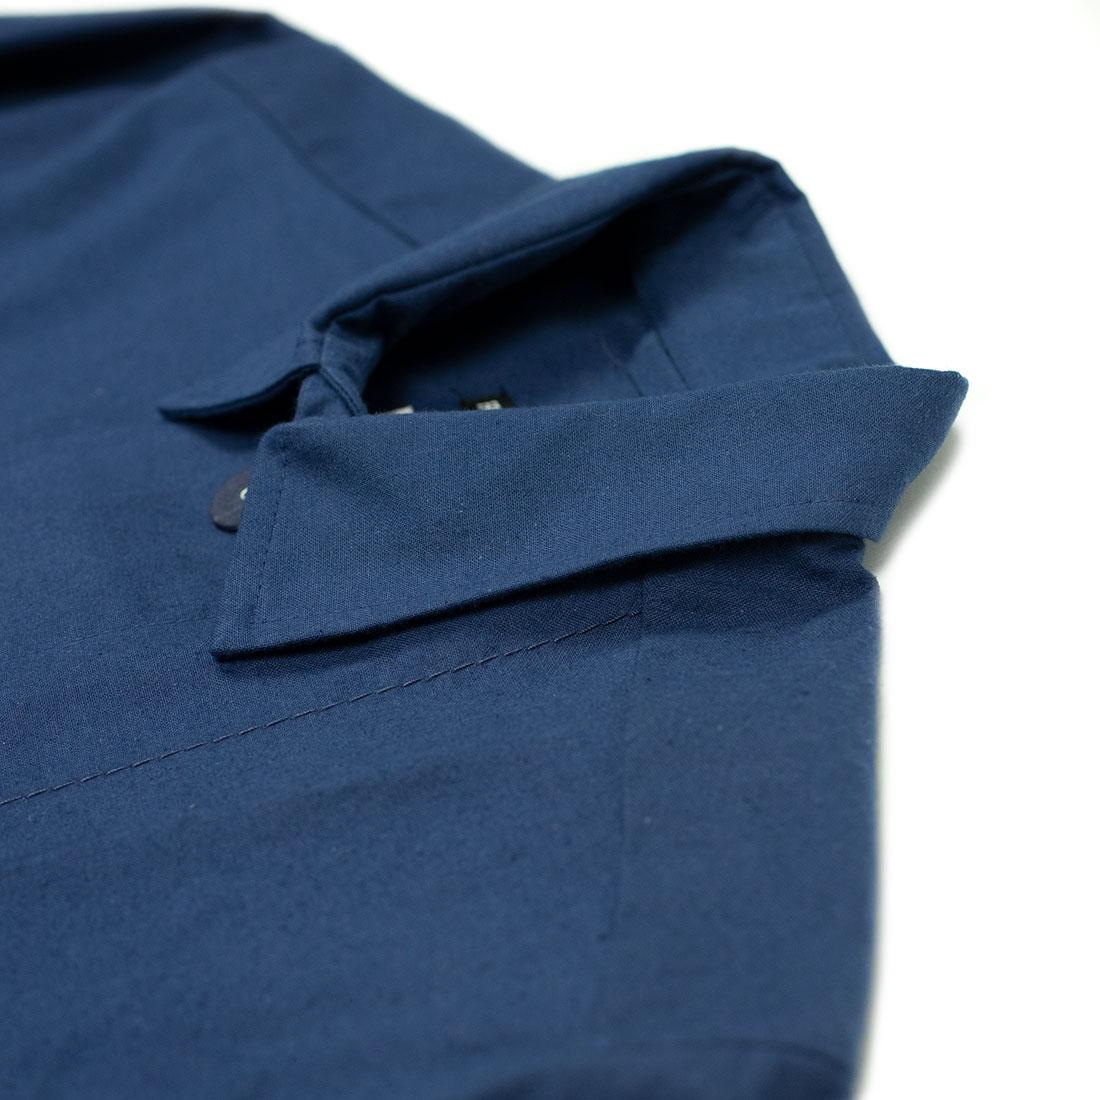 Frank Leder Spring Summer 2021 SS21 Made in Germany deadstock indigo dyed bed linen (13).jpg